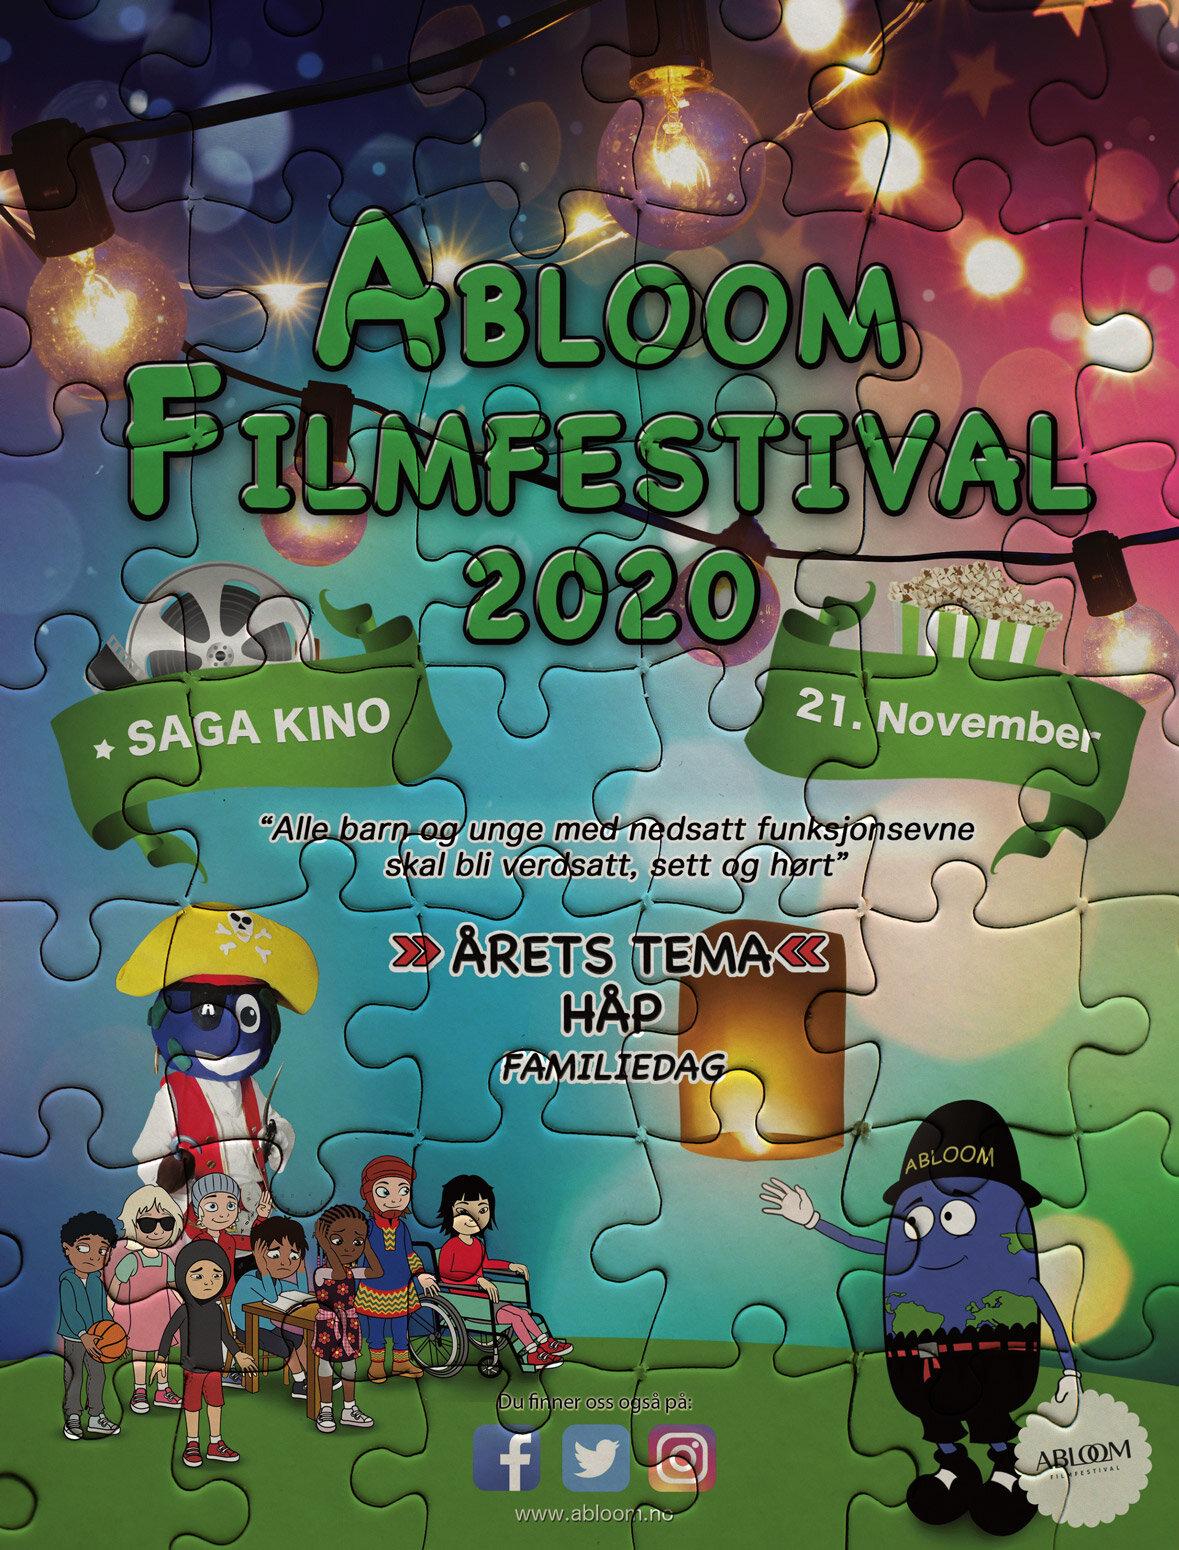 Abloom-filmfestival-2020-Familiedag-puzzle.jpg